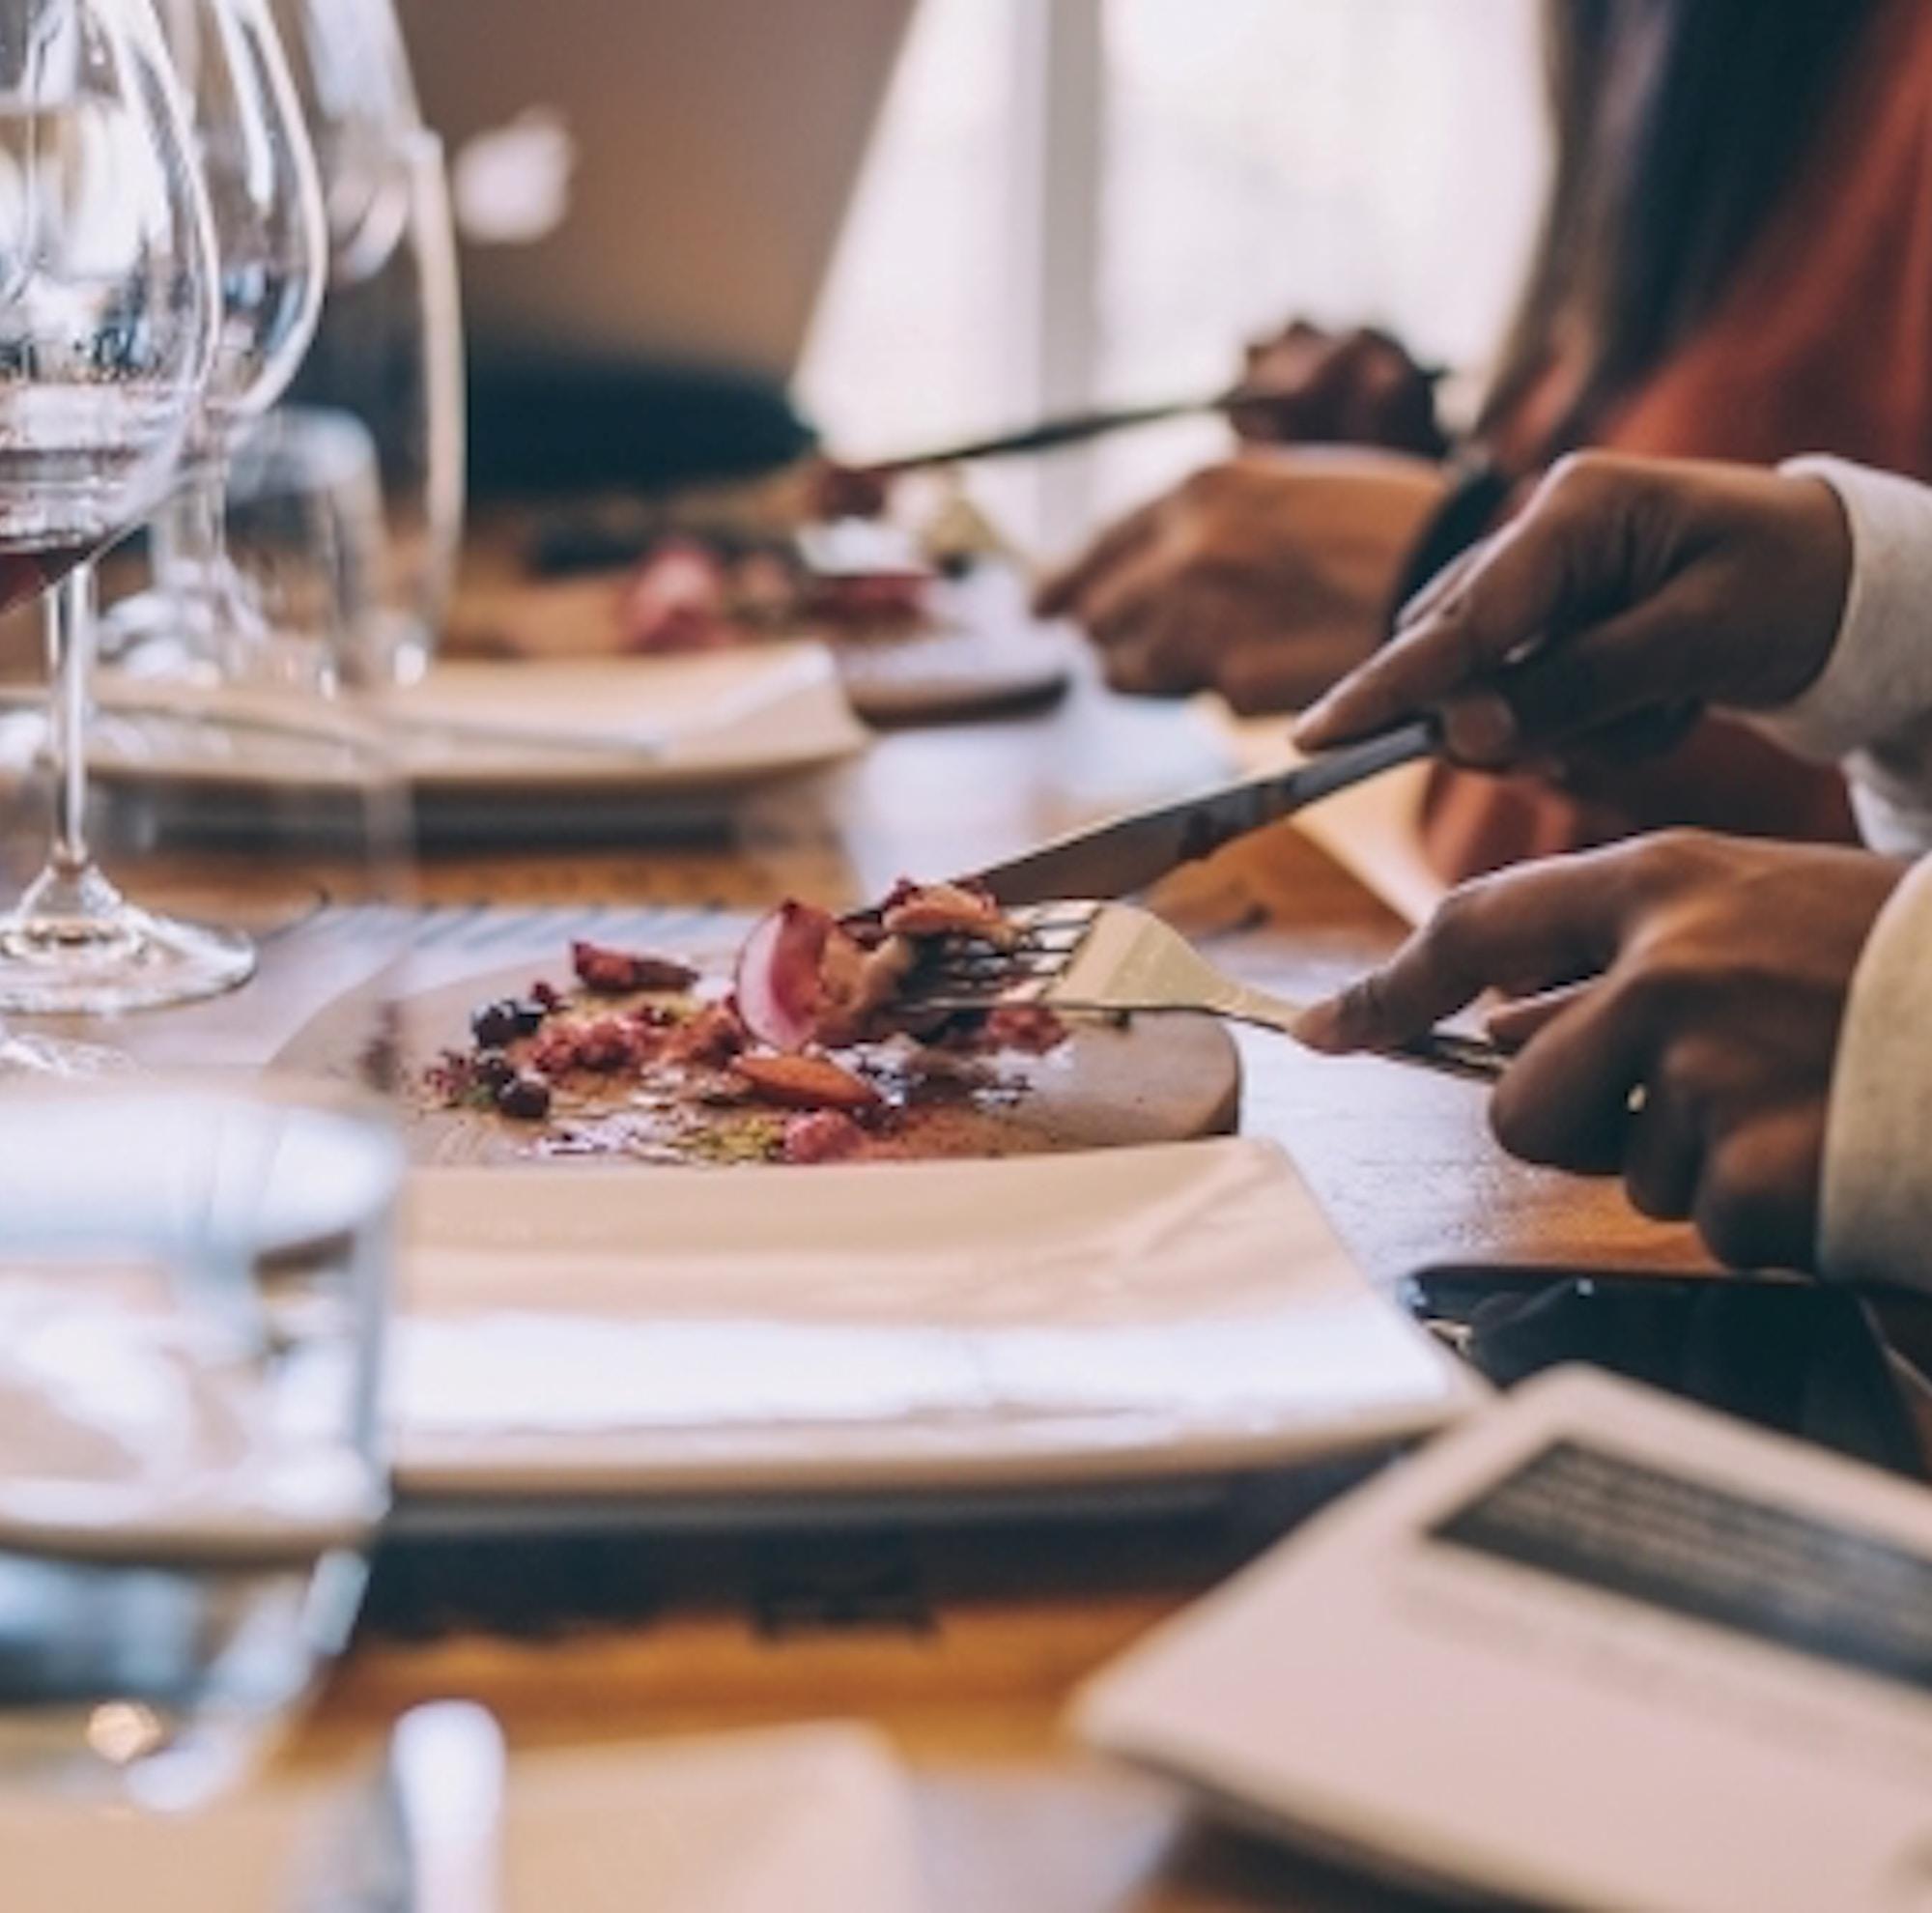 Fine dining at Creation Wine Estate Image credit Shawn Ugulu